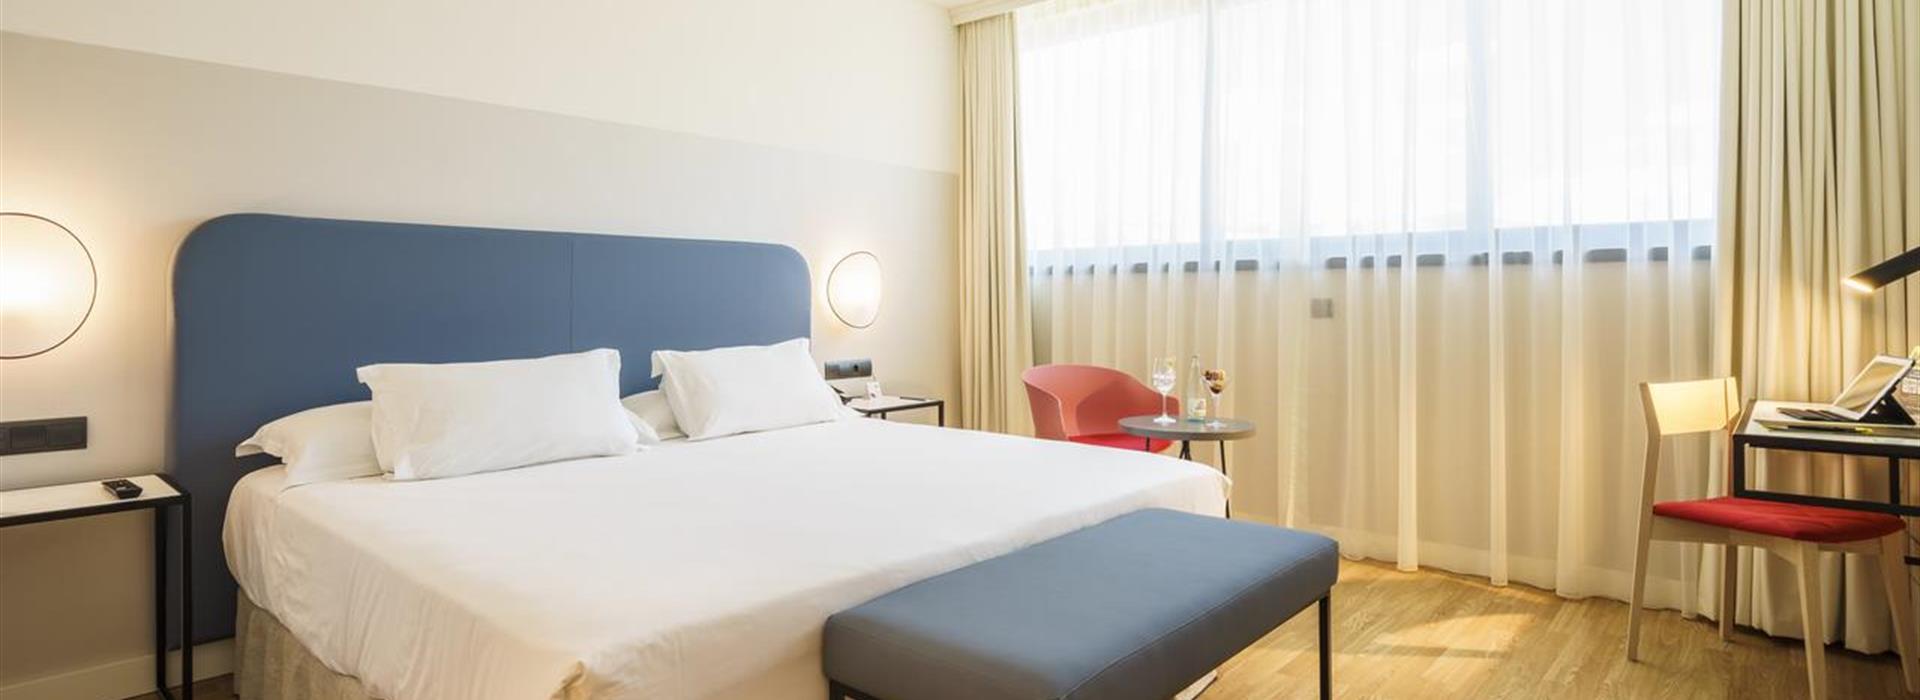 hotel-sercotel-malaga